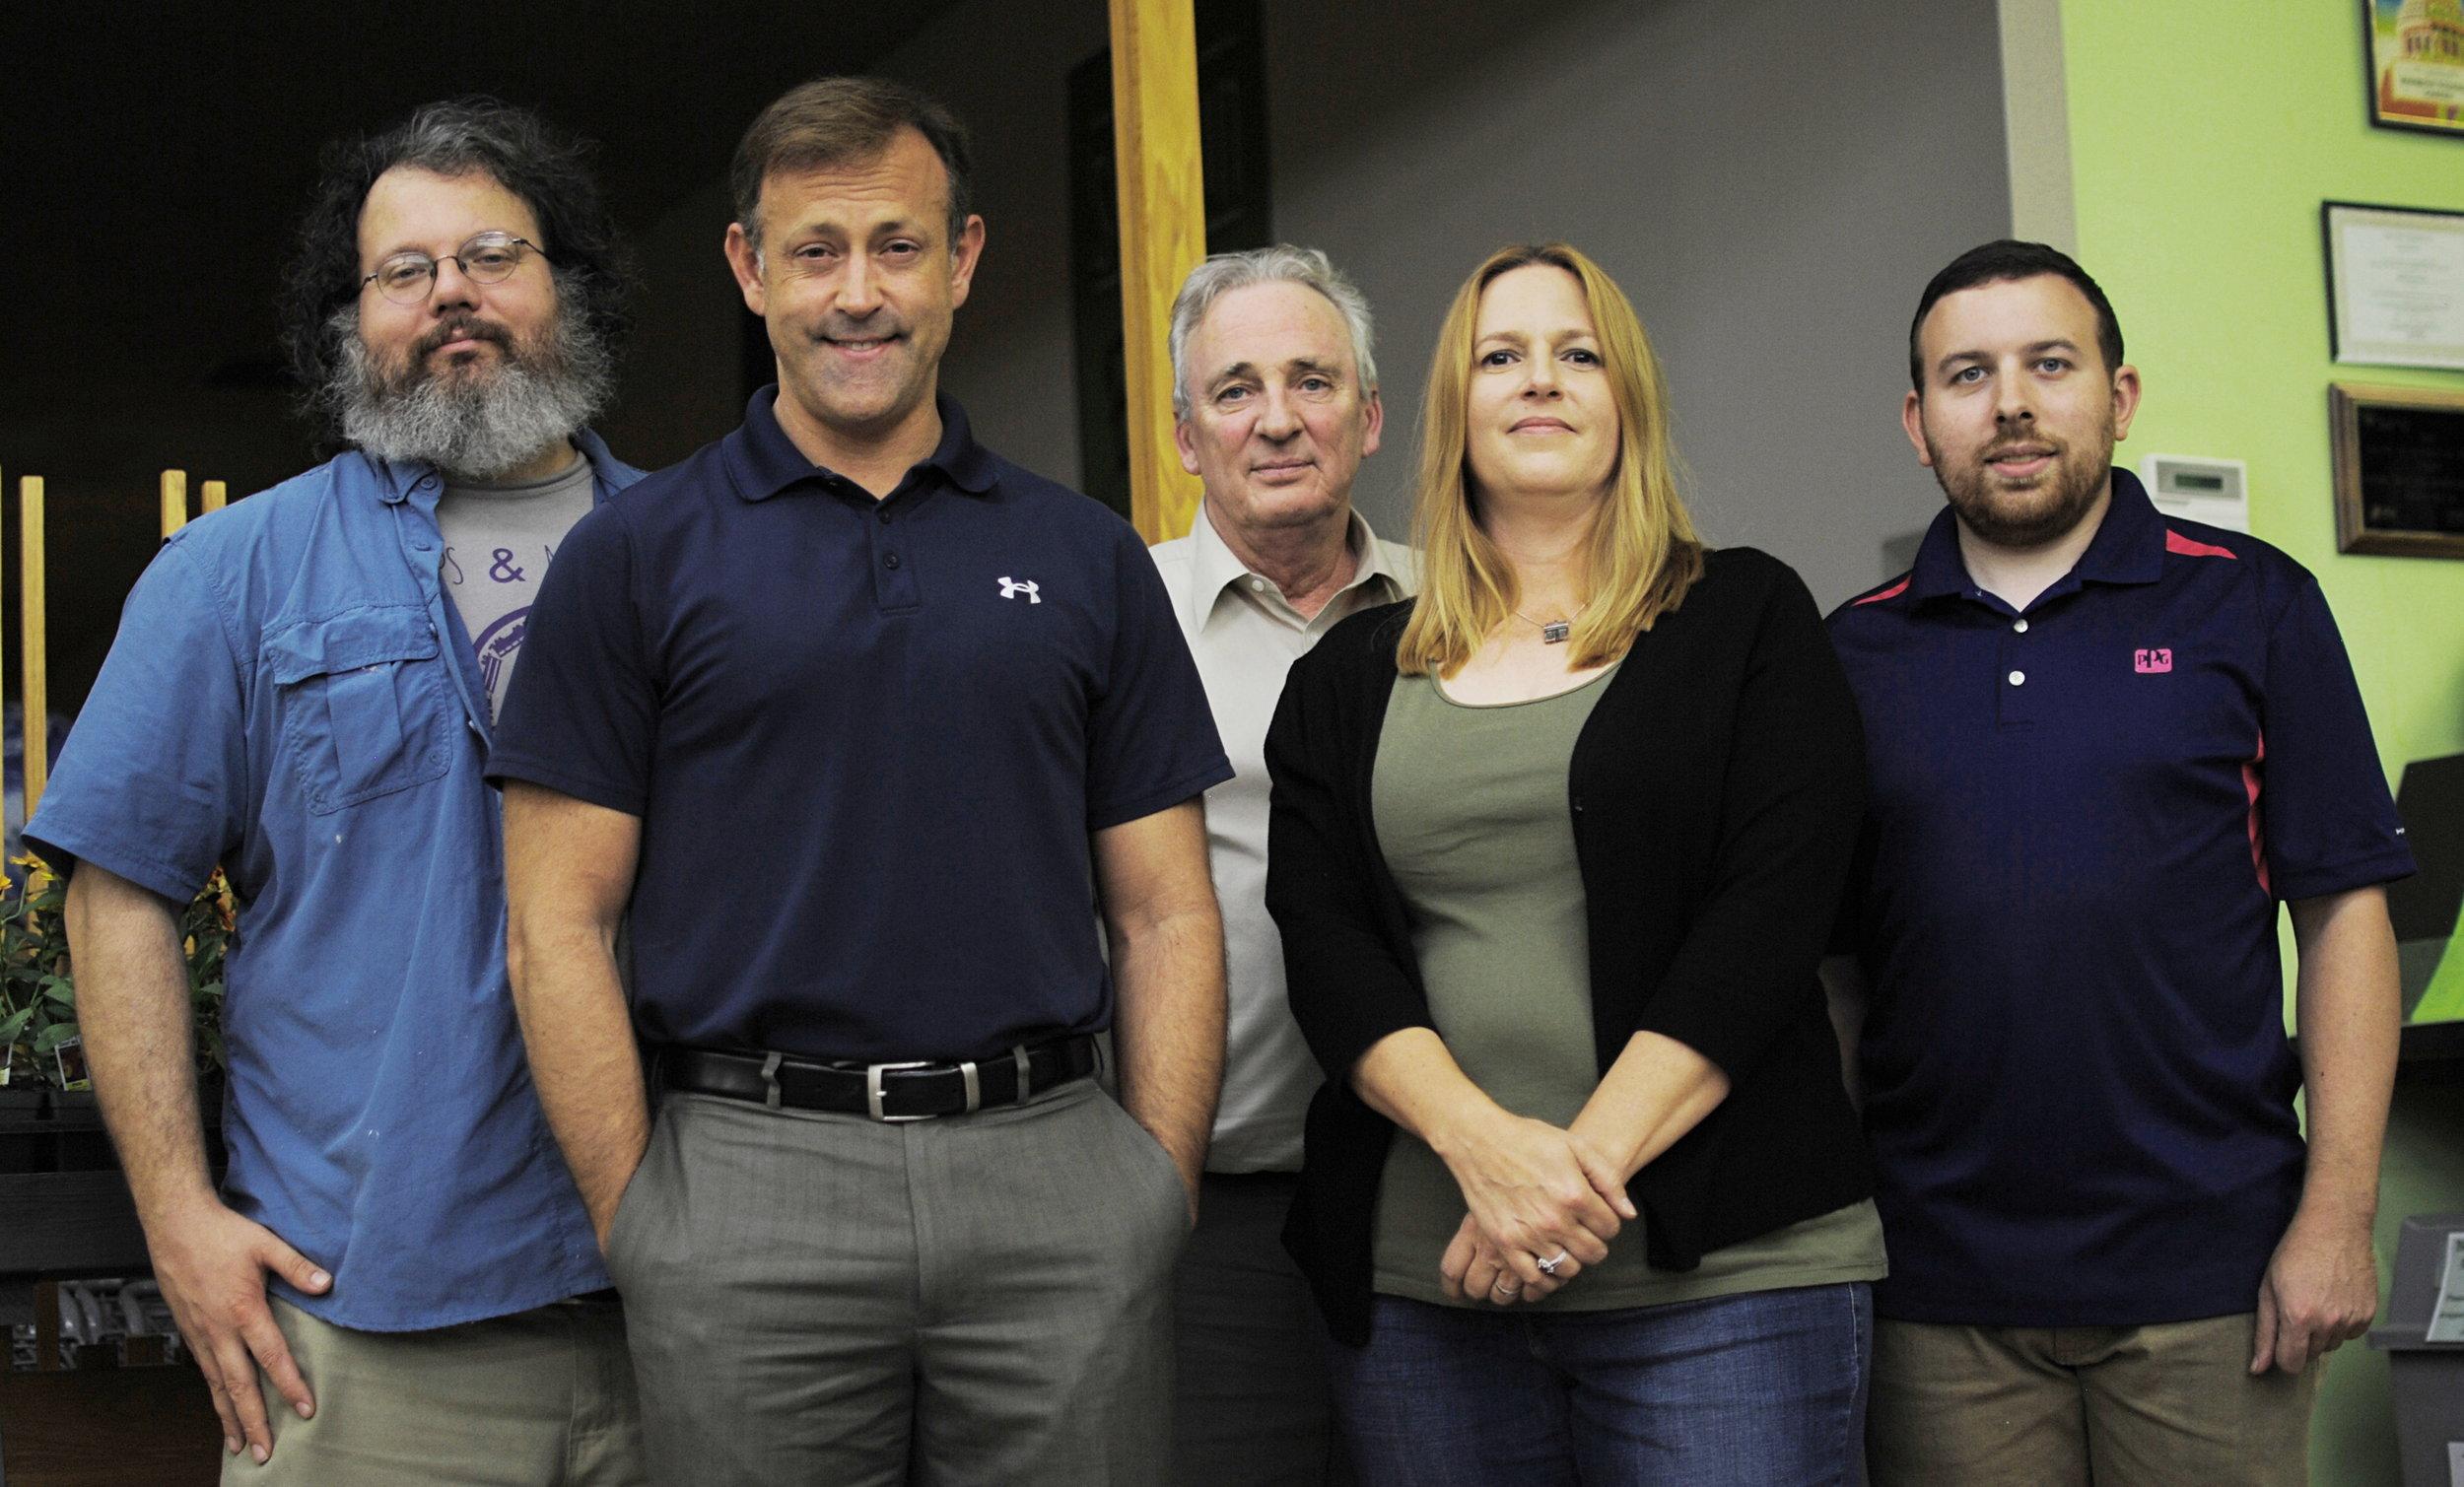 The Mississippi Humanist Association Board of Directors (2017) from left: Patrick Jerome (Communications Officer), Neil Carter (Vice-President), Tom Dennis (Secretary), Kim Gibson (President) and Stephen Frank (Treasurer).